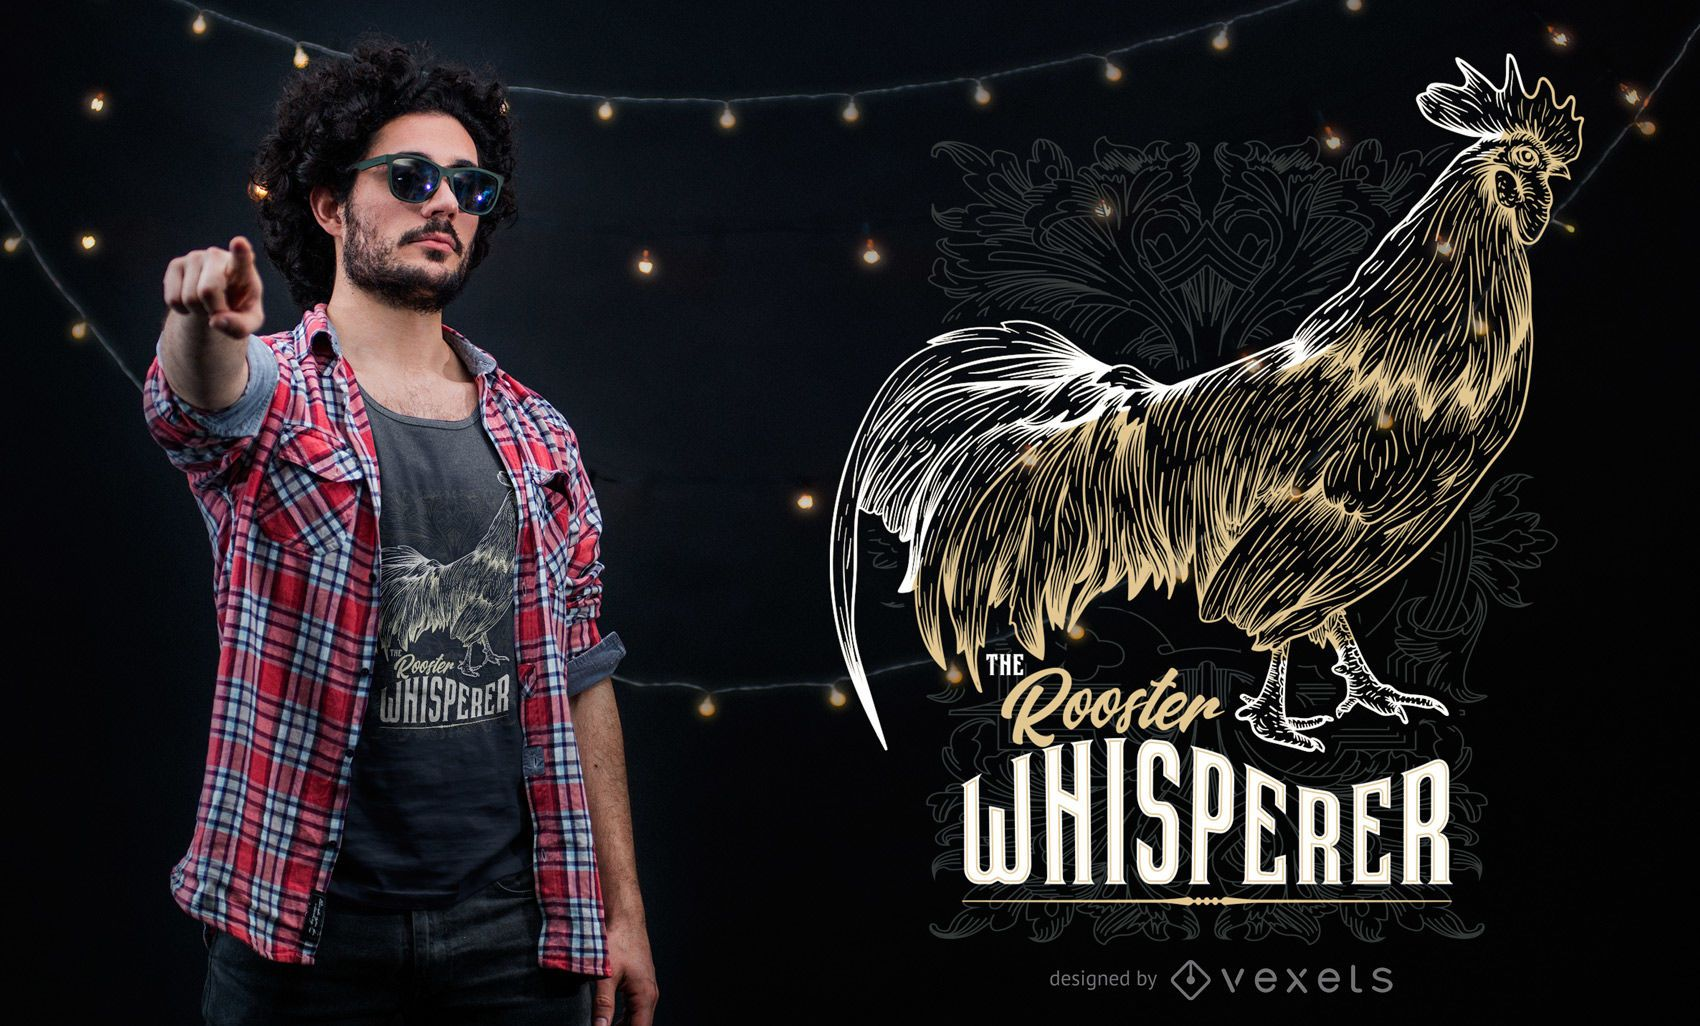 Rooster Whisperer Graphic T-shirt Design